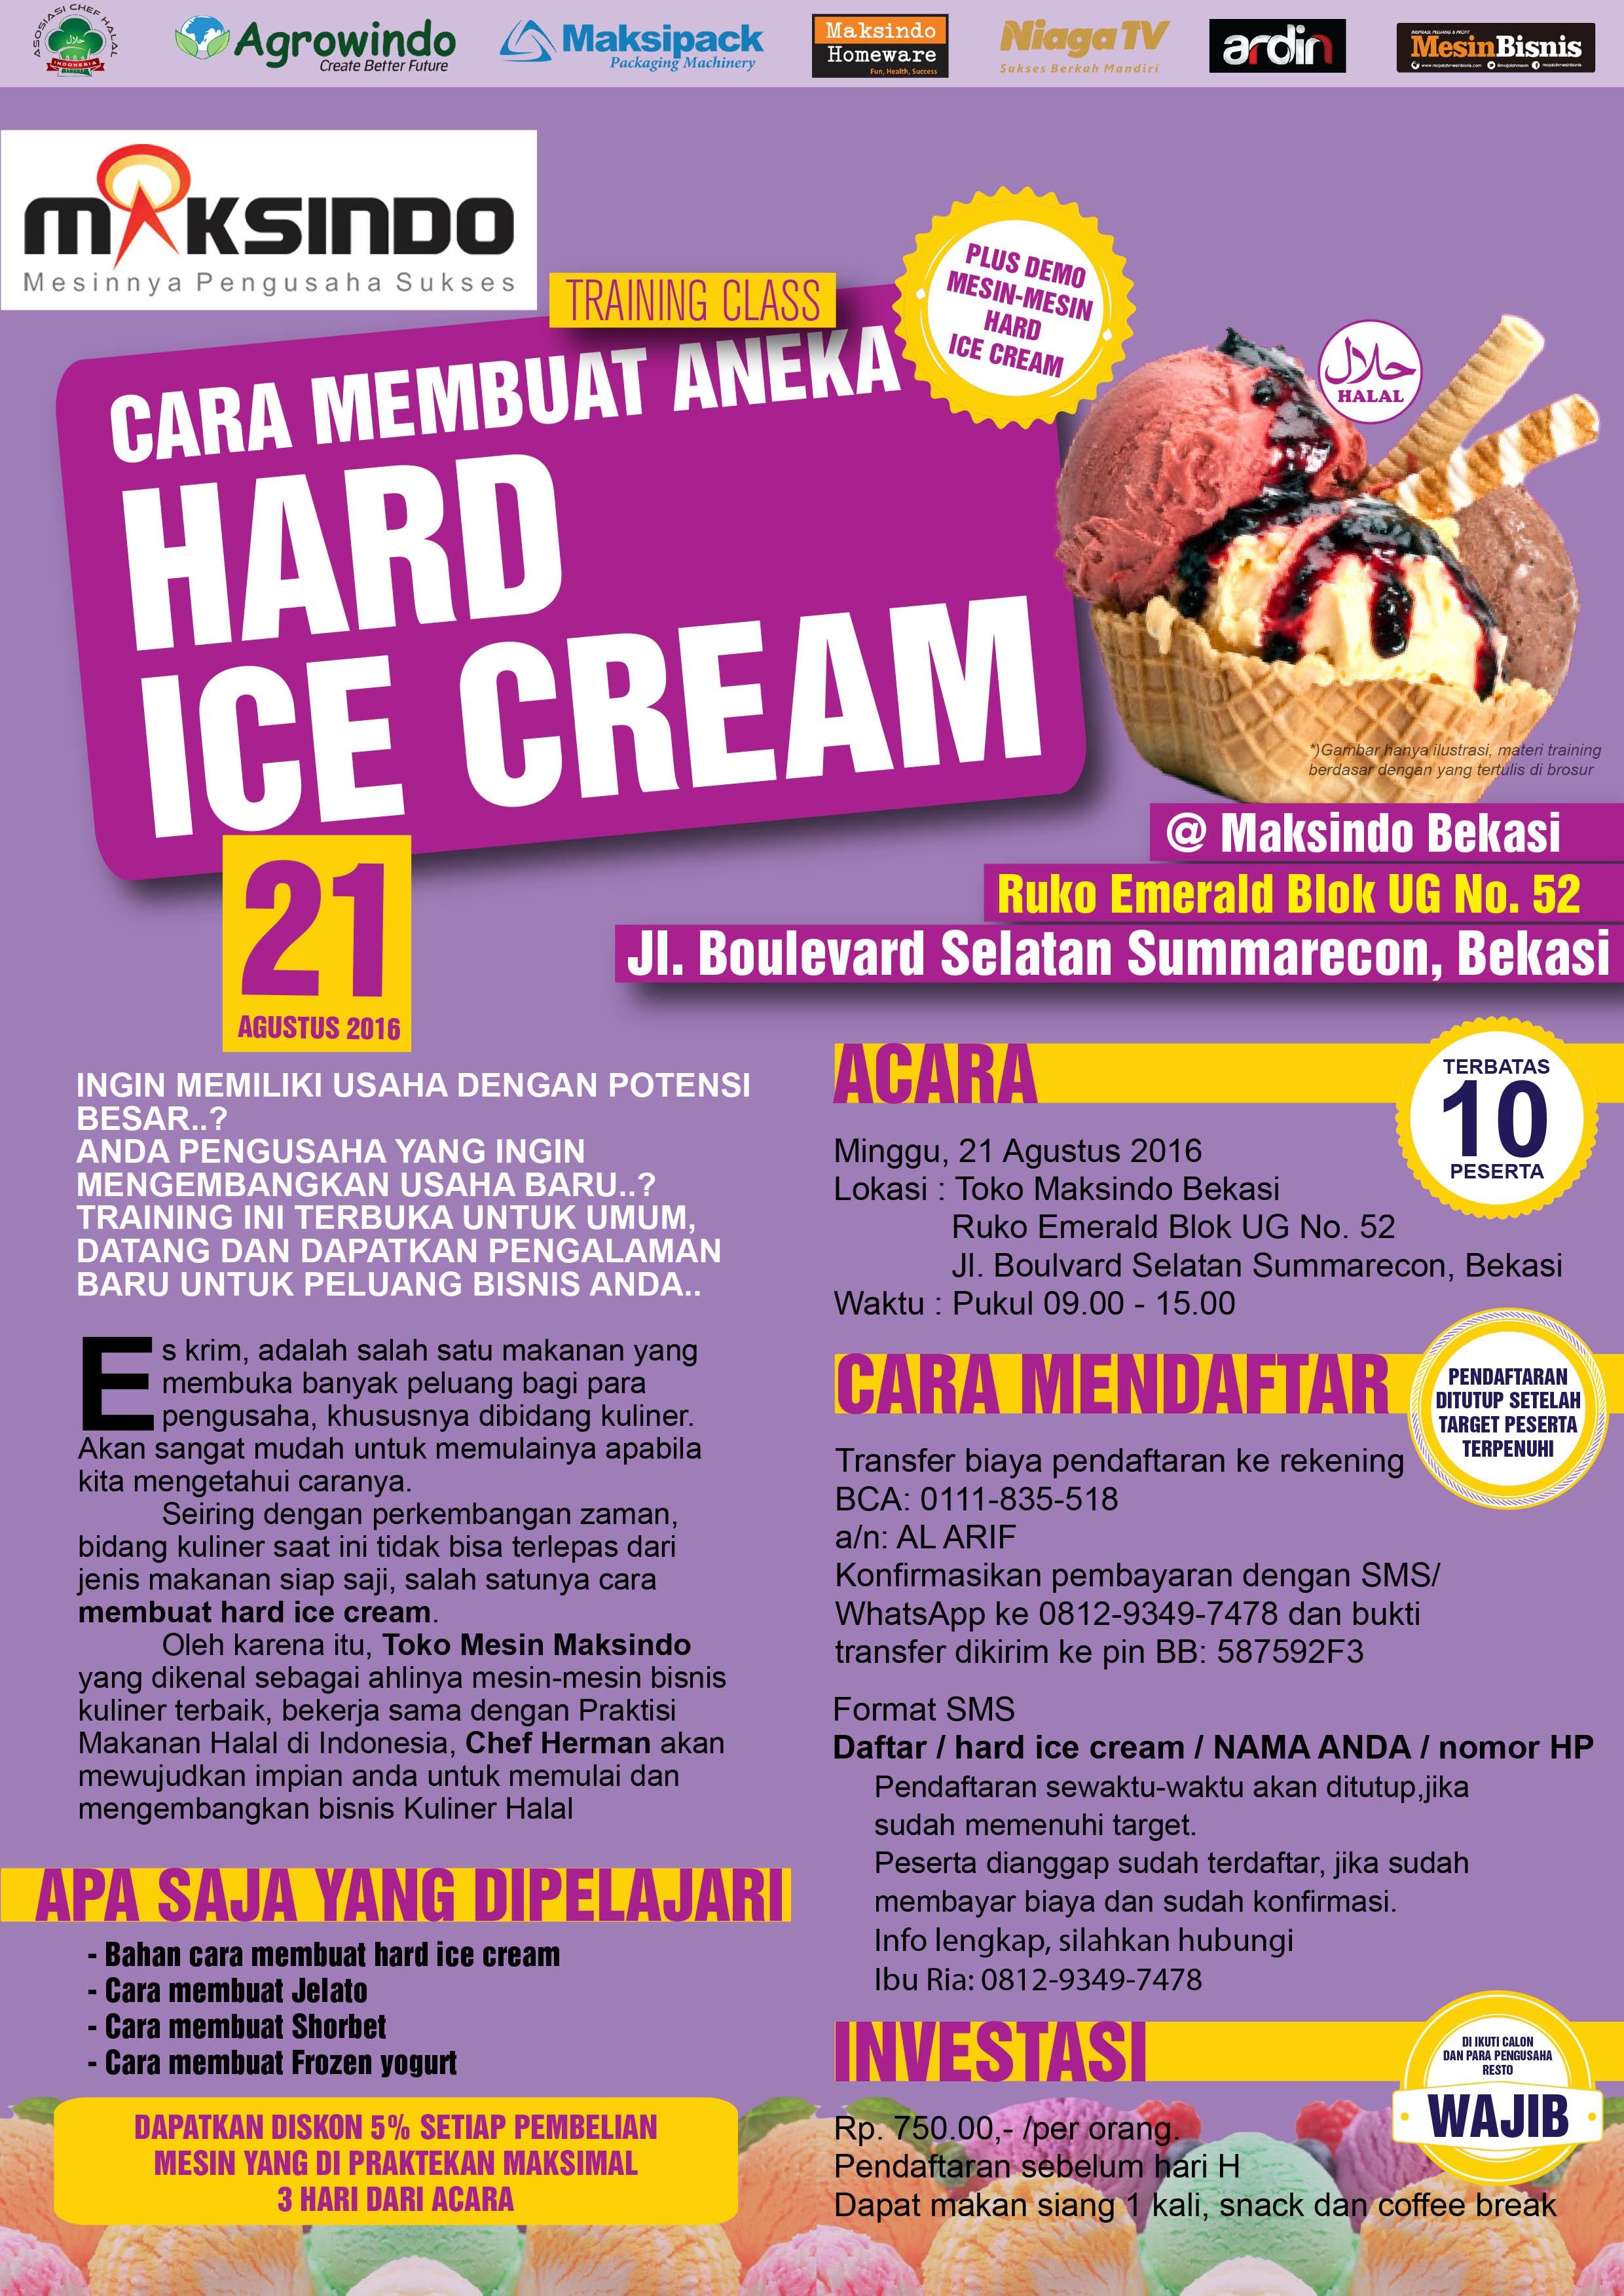 Training Usaha Hard Ice Cream di Bekasi 21 Agustus 2016